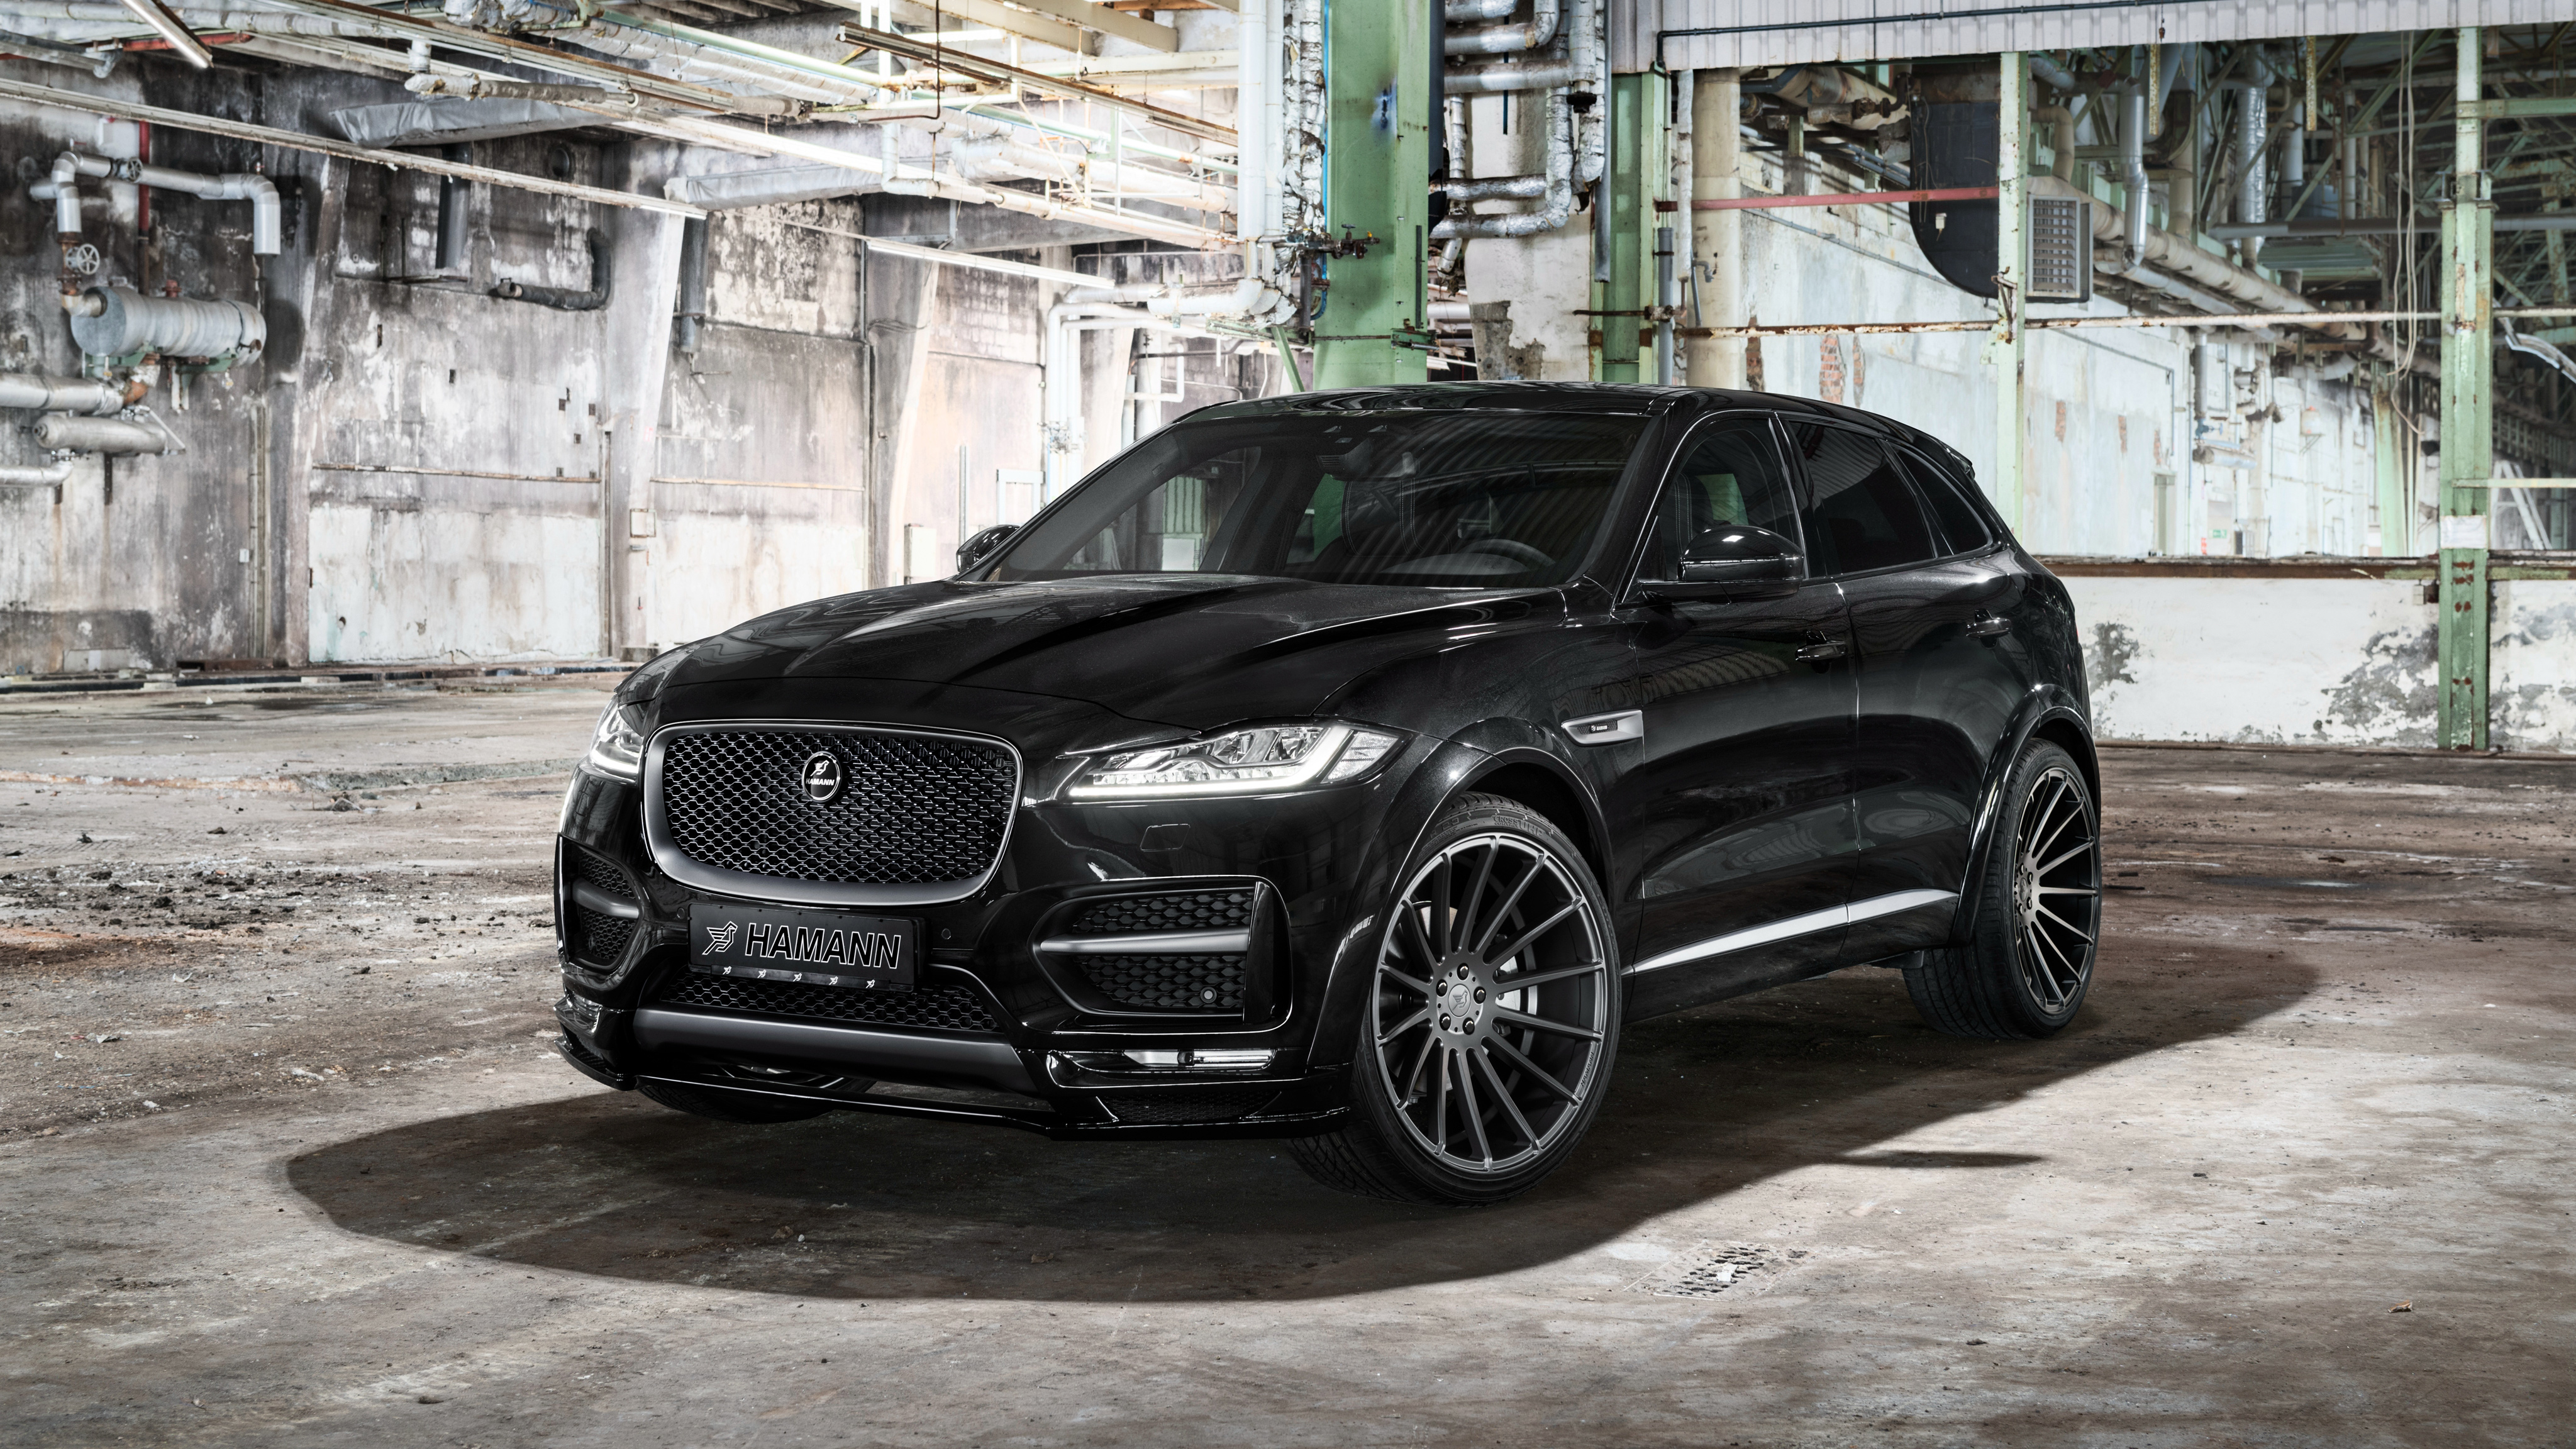 2017 Hamann Jaguar F Pace 4K Wallpaper | HD Car Wallpapers ...